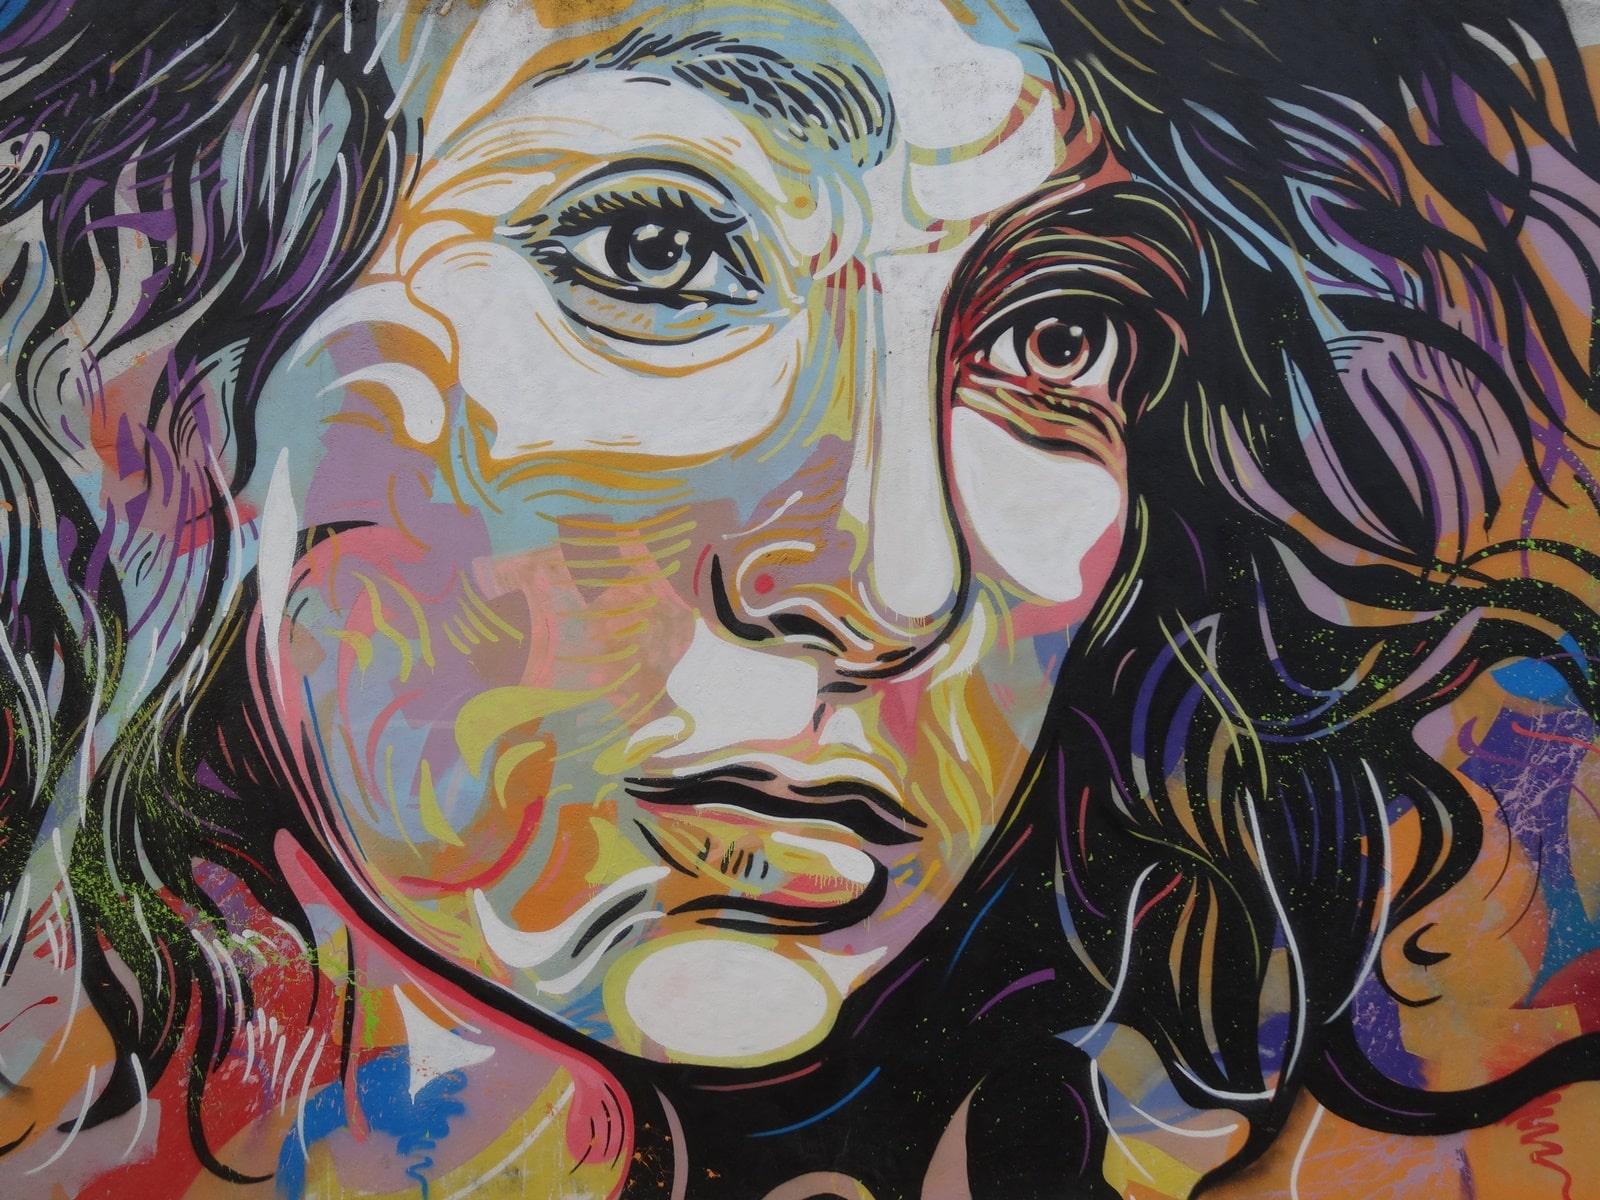 Le-Street-Art